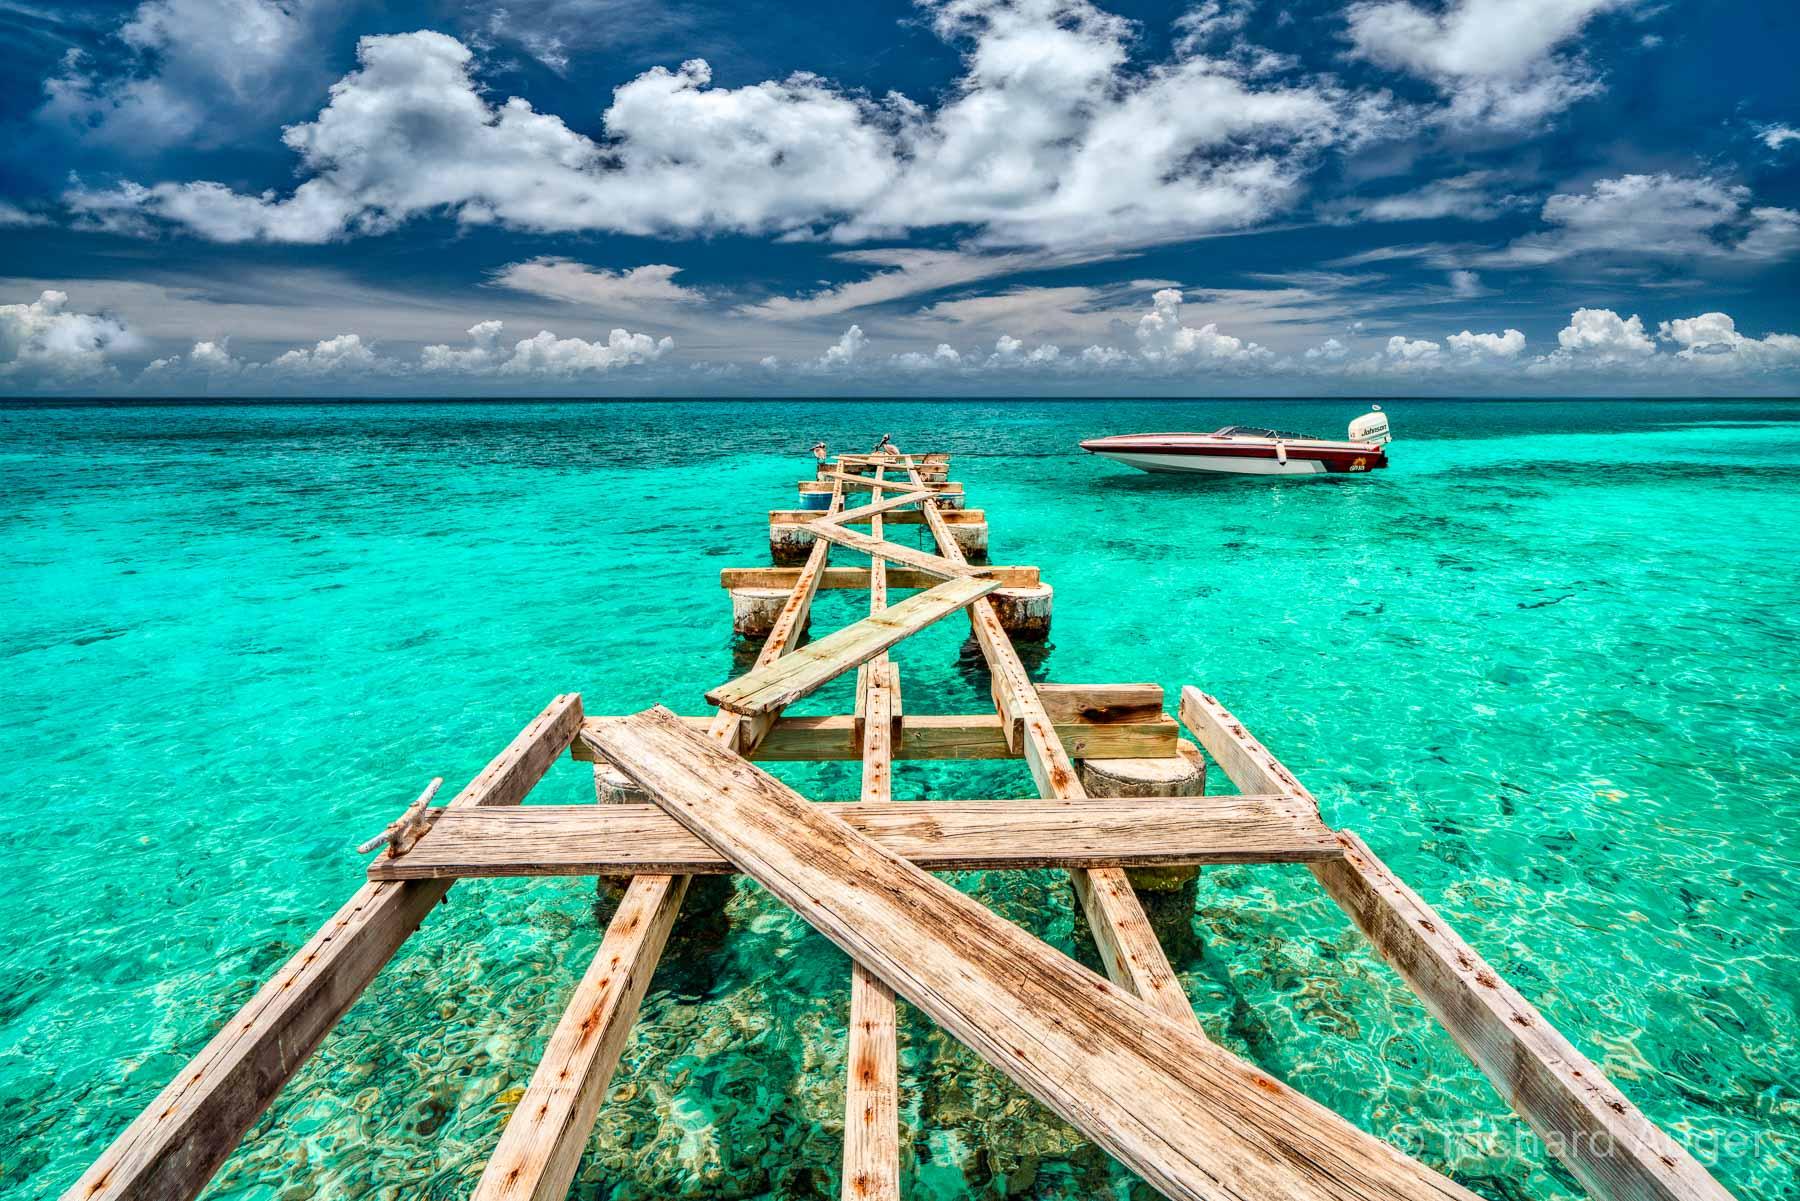 Dock, British Virgin Islands, Tropical, Powerboat, Ocean